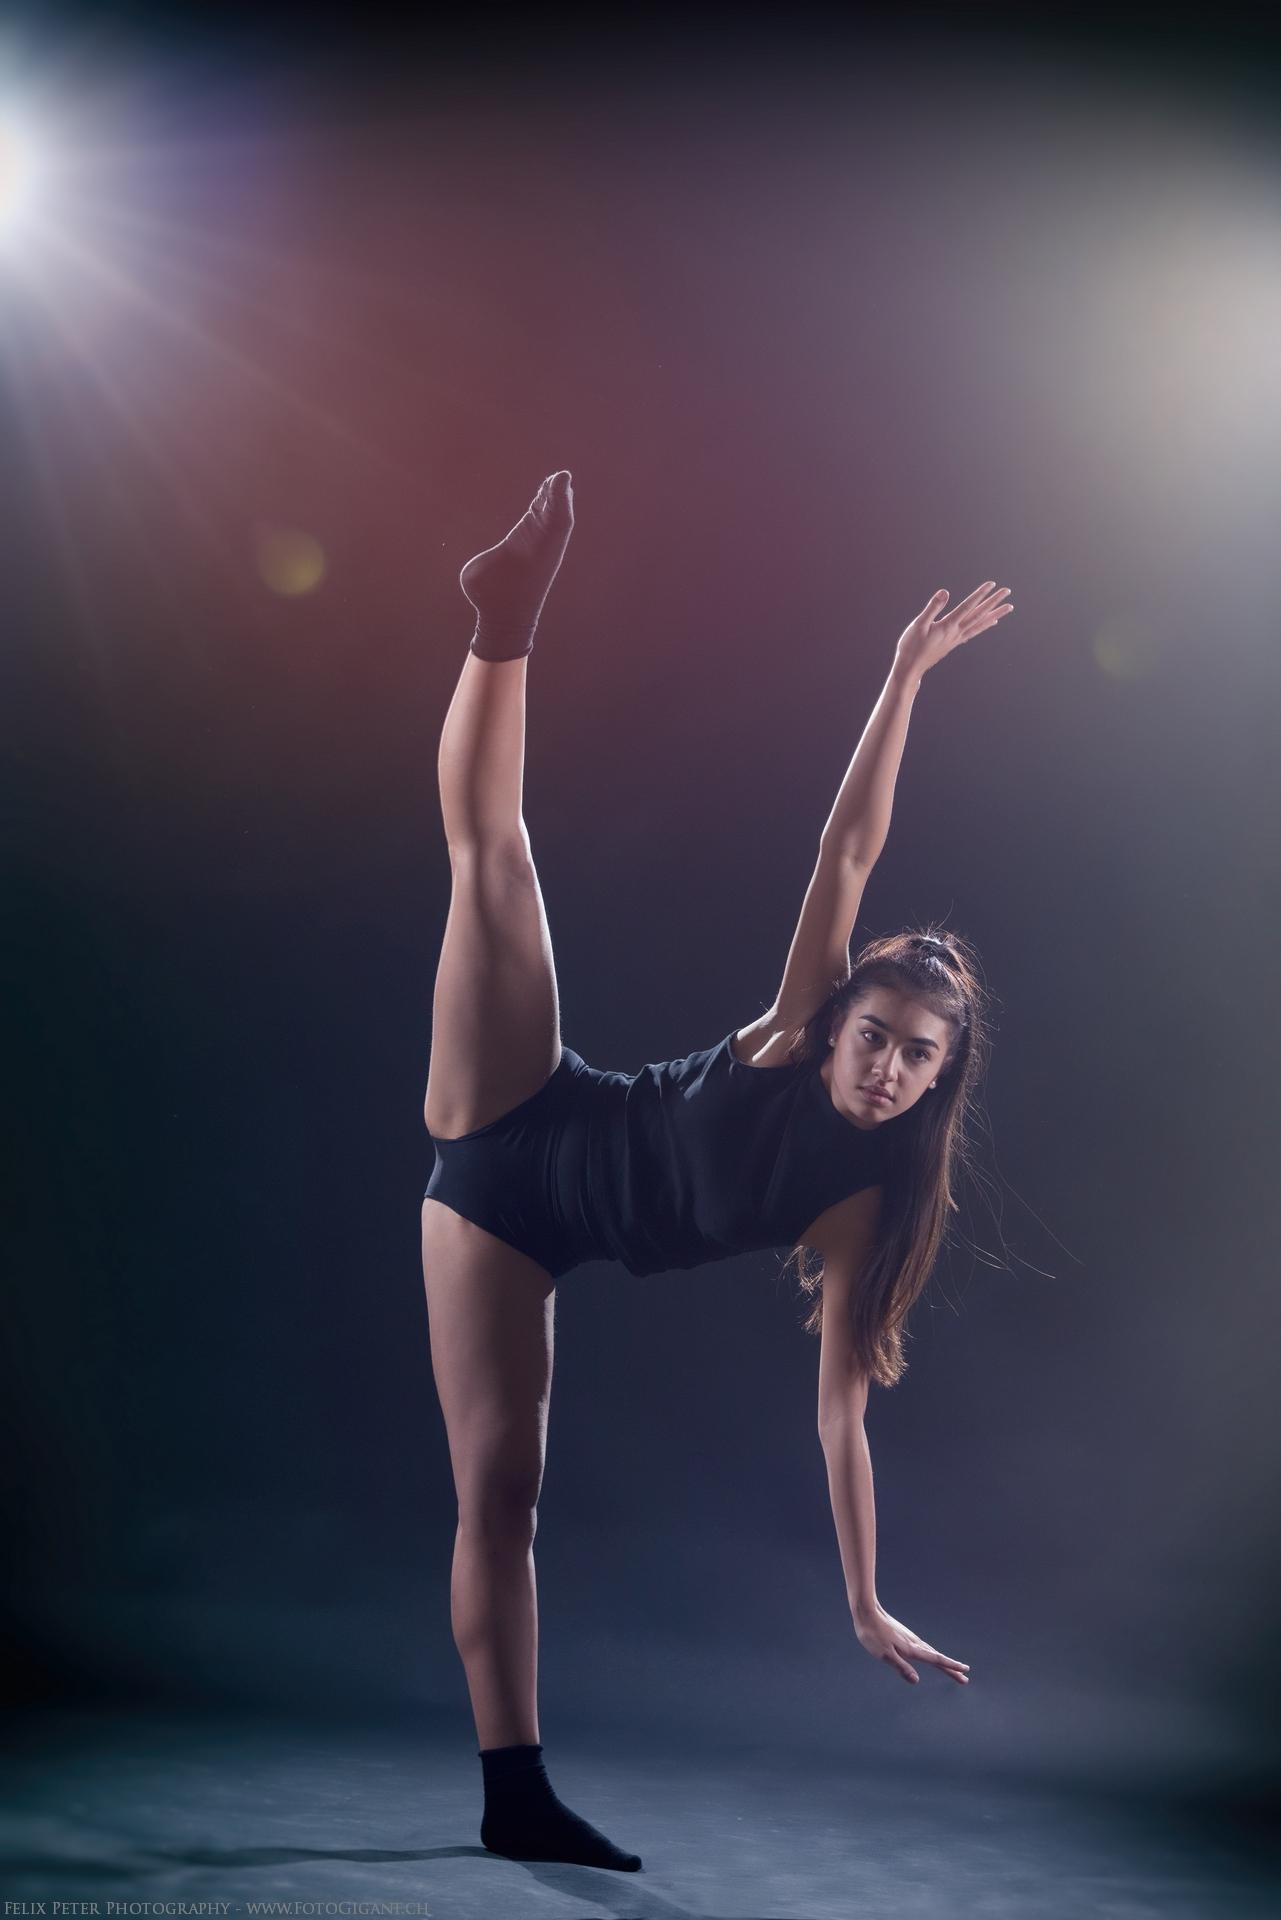 Felix-Peter-Yoga-Pilates-Dance-Fotografie_Bern_095.jpg